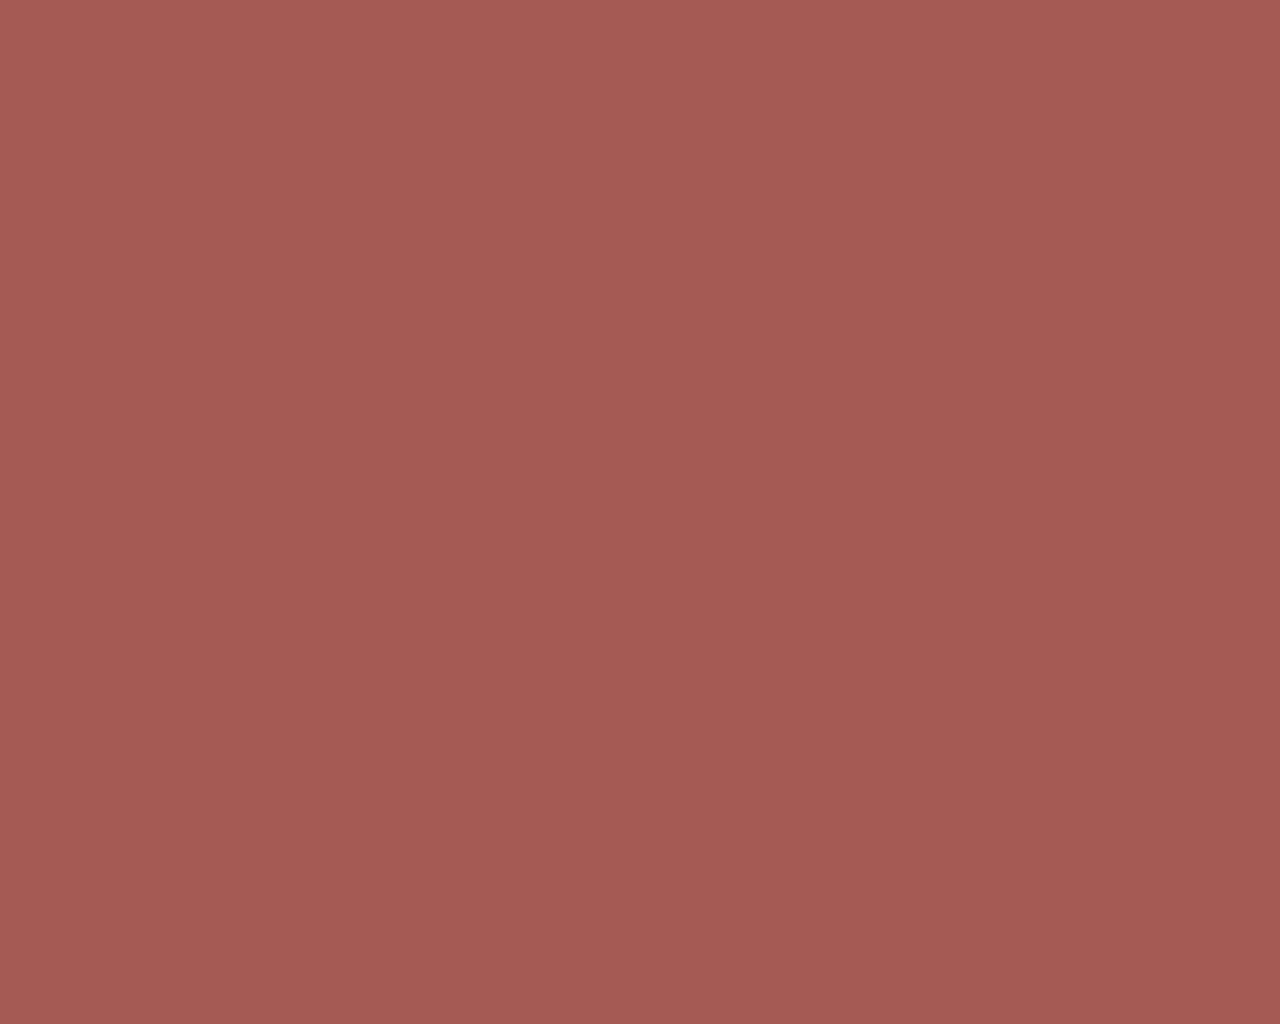 1280x1024 Redwood Solid Color Background